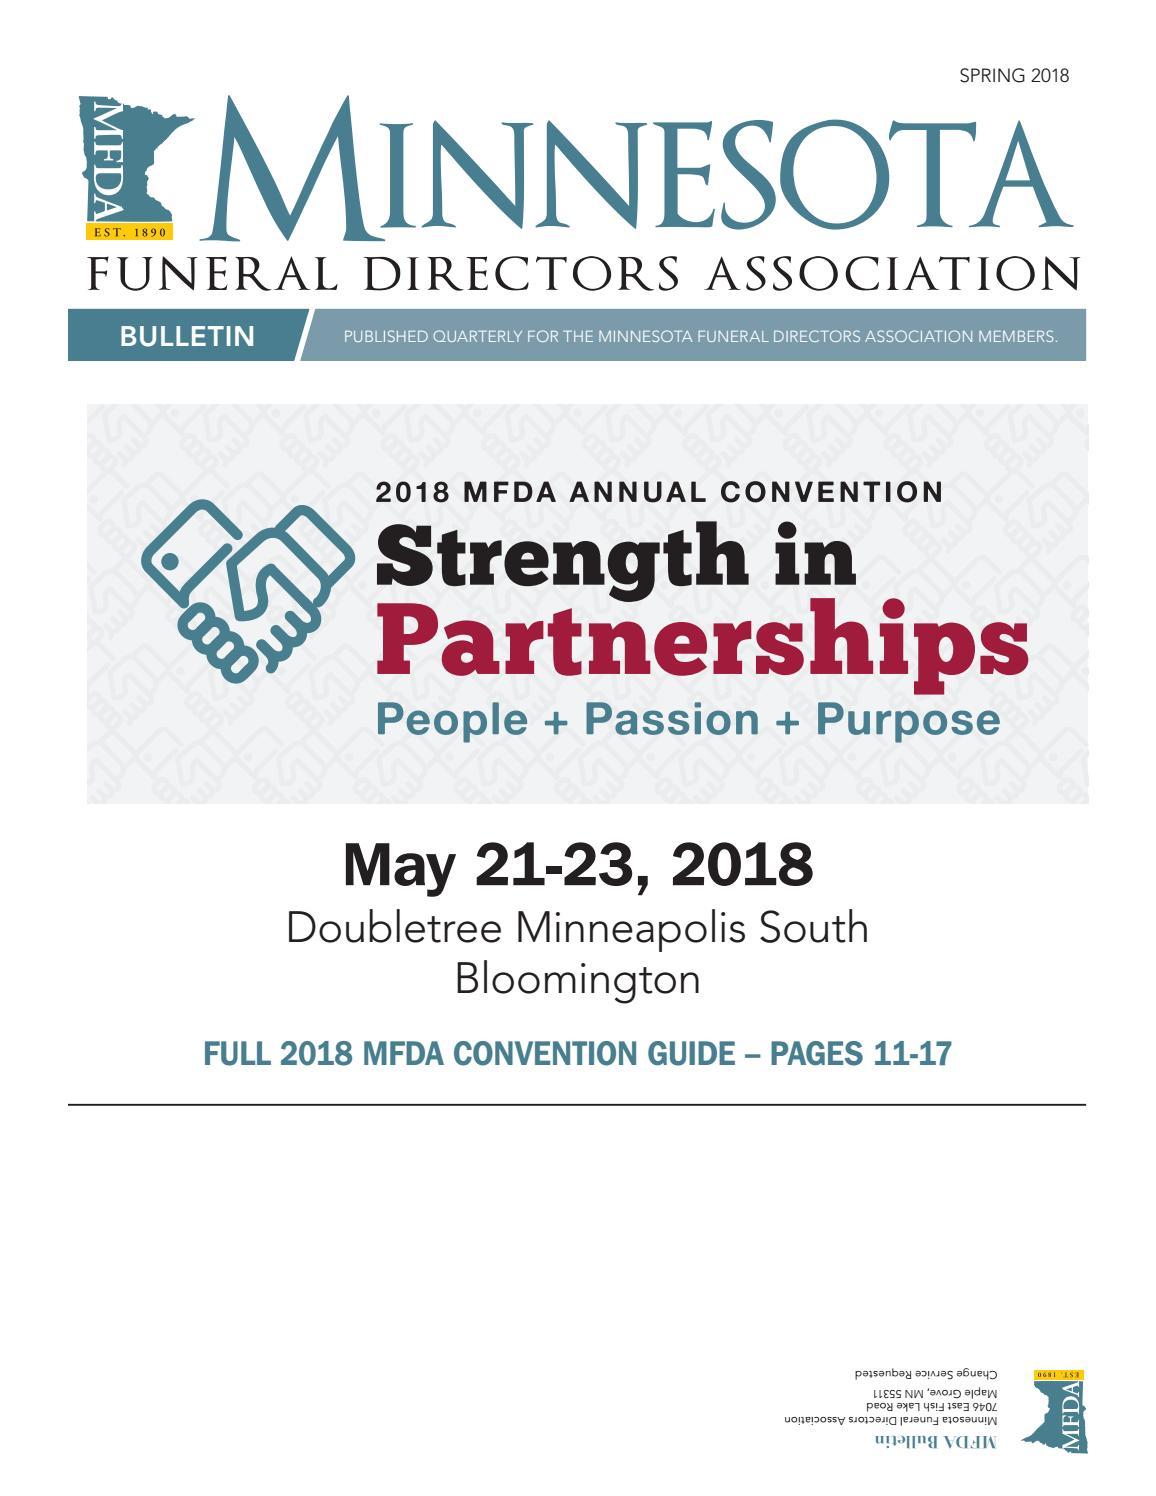 MFDA Bulletin Spring 2018 by Pernsteiner Creative Group, Inc  - issuu